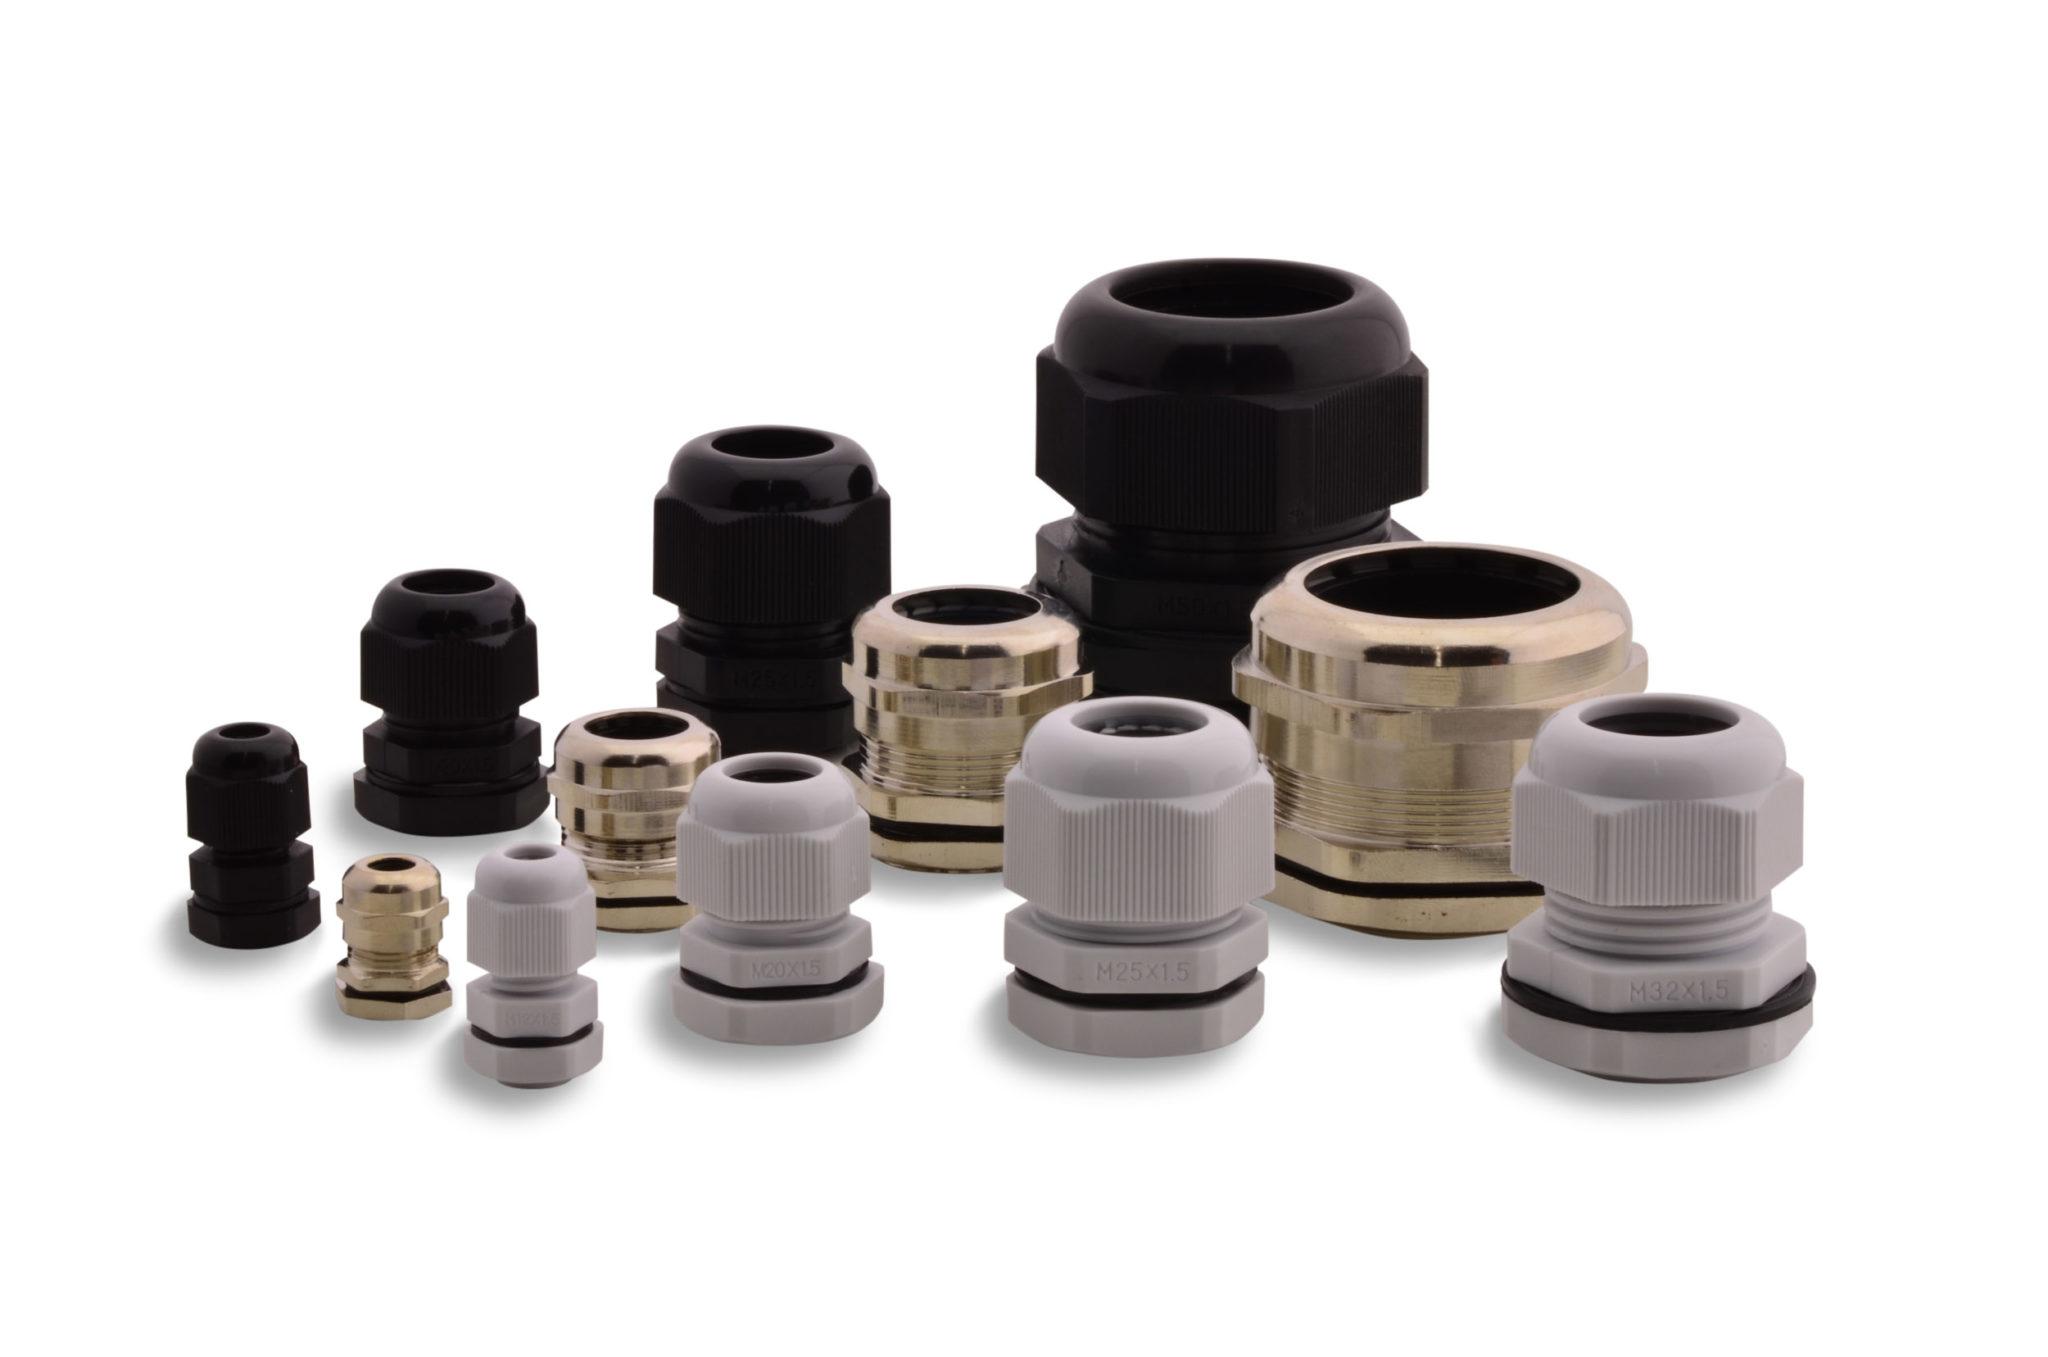 BOXEXPERT-Polyamid-grau-schwarz-Messing-Kabelverschraubung-BXPKVS-Gruppenbild